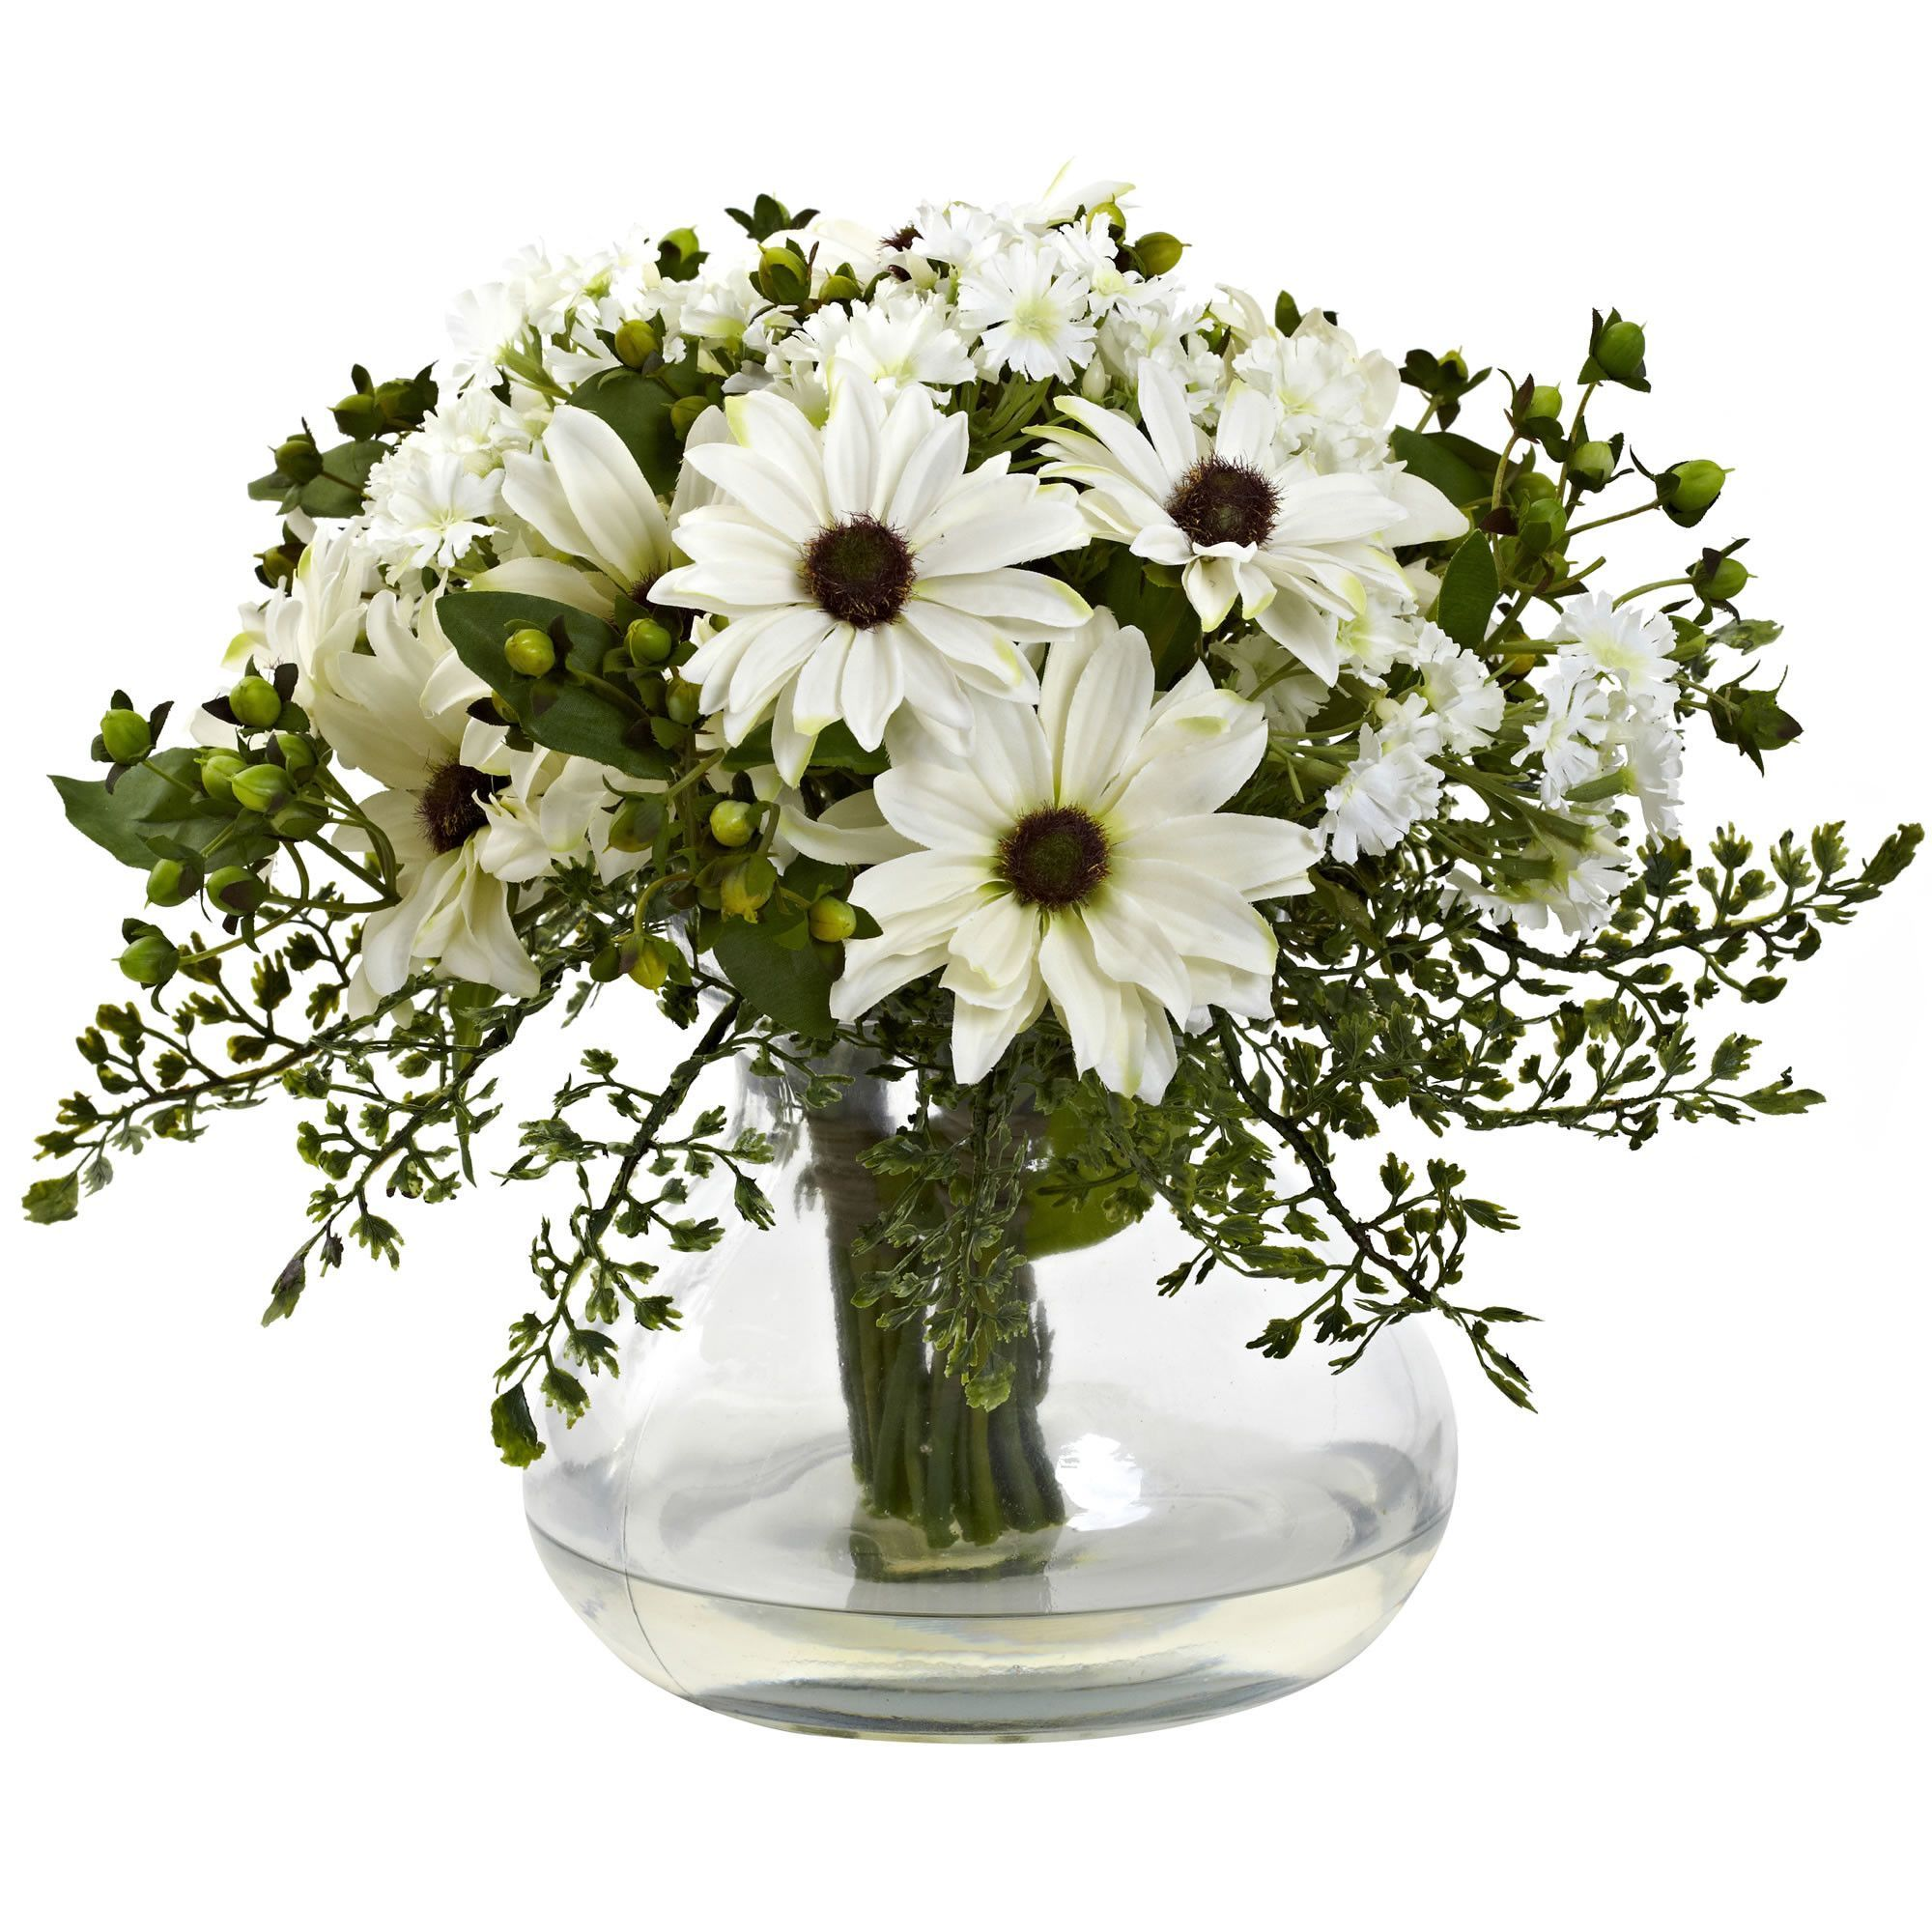 Nearly natural mixed daisy floral arrangement in vase flower artificial flowers decorative vasescamping productsflower artfloral arrangementsdaisiesgardeningnaturalcolourcenterpieces izmirmasajfo